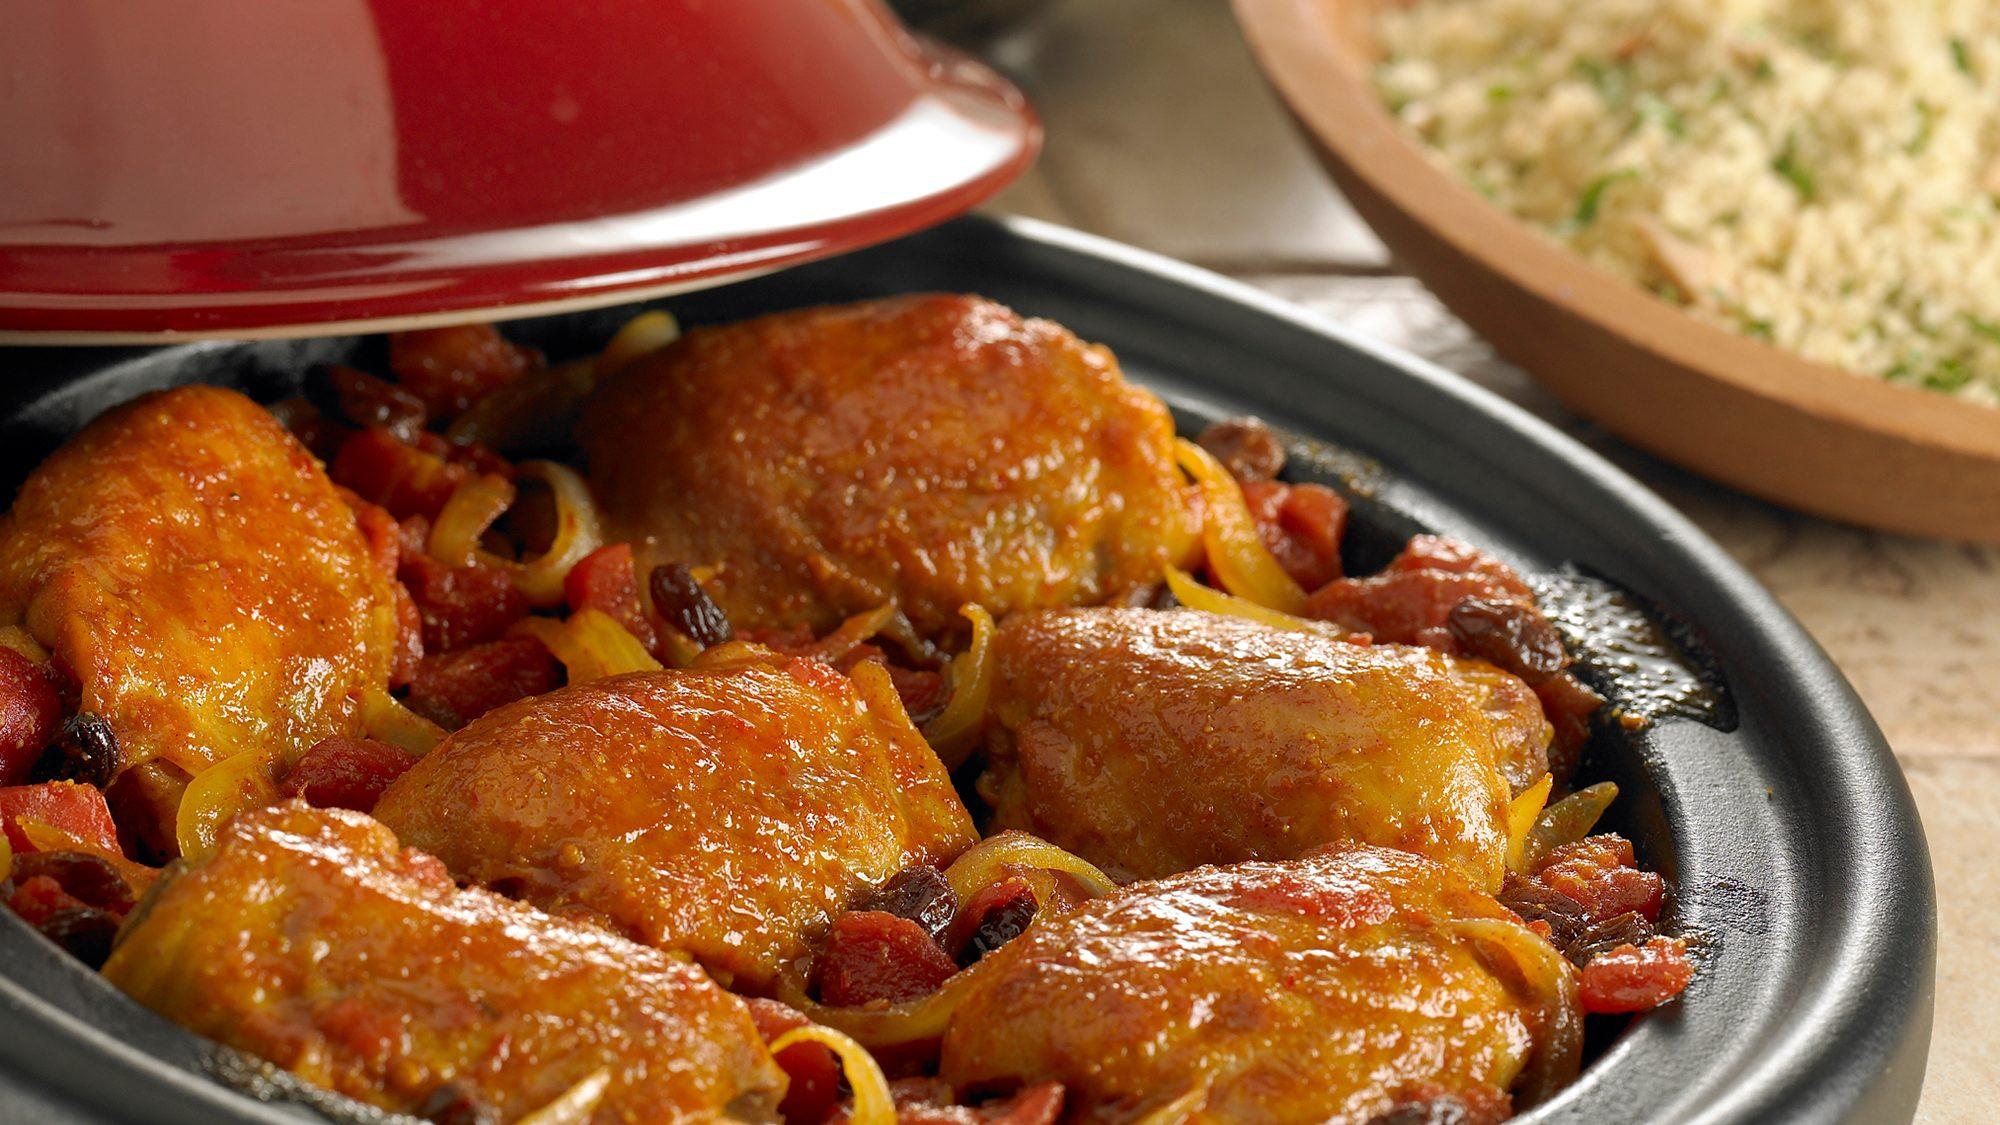 McCormick Gourmet Moroccan Chicken Tagine